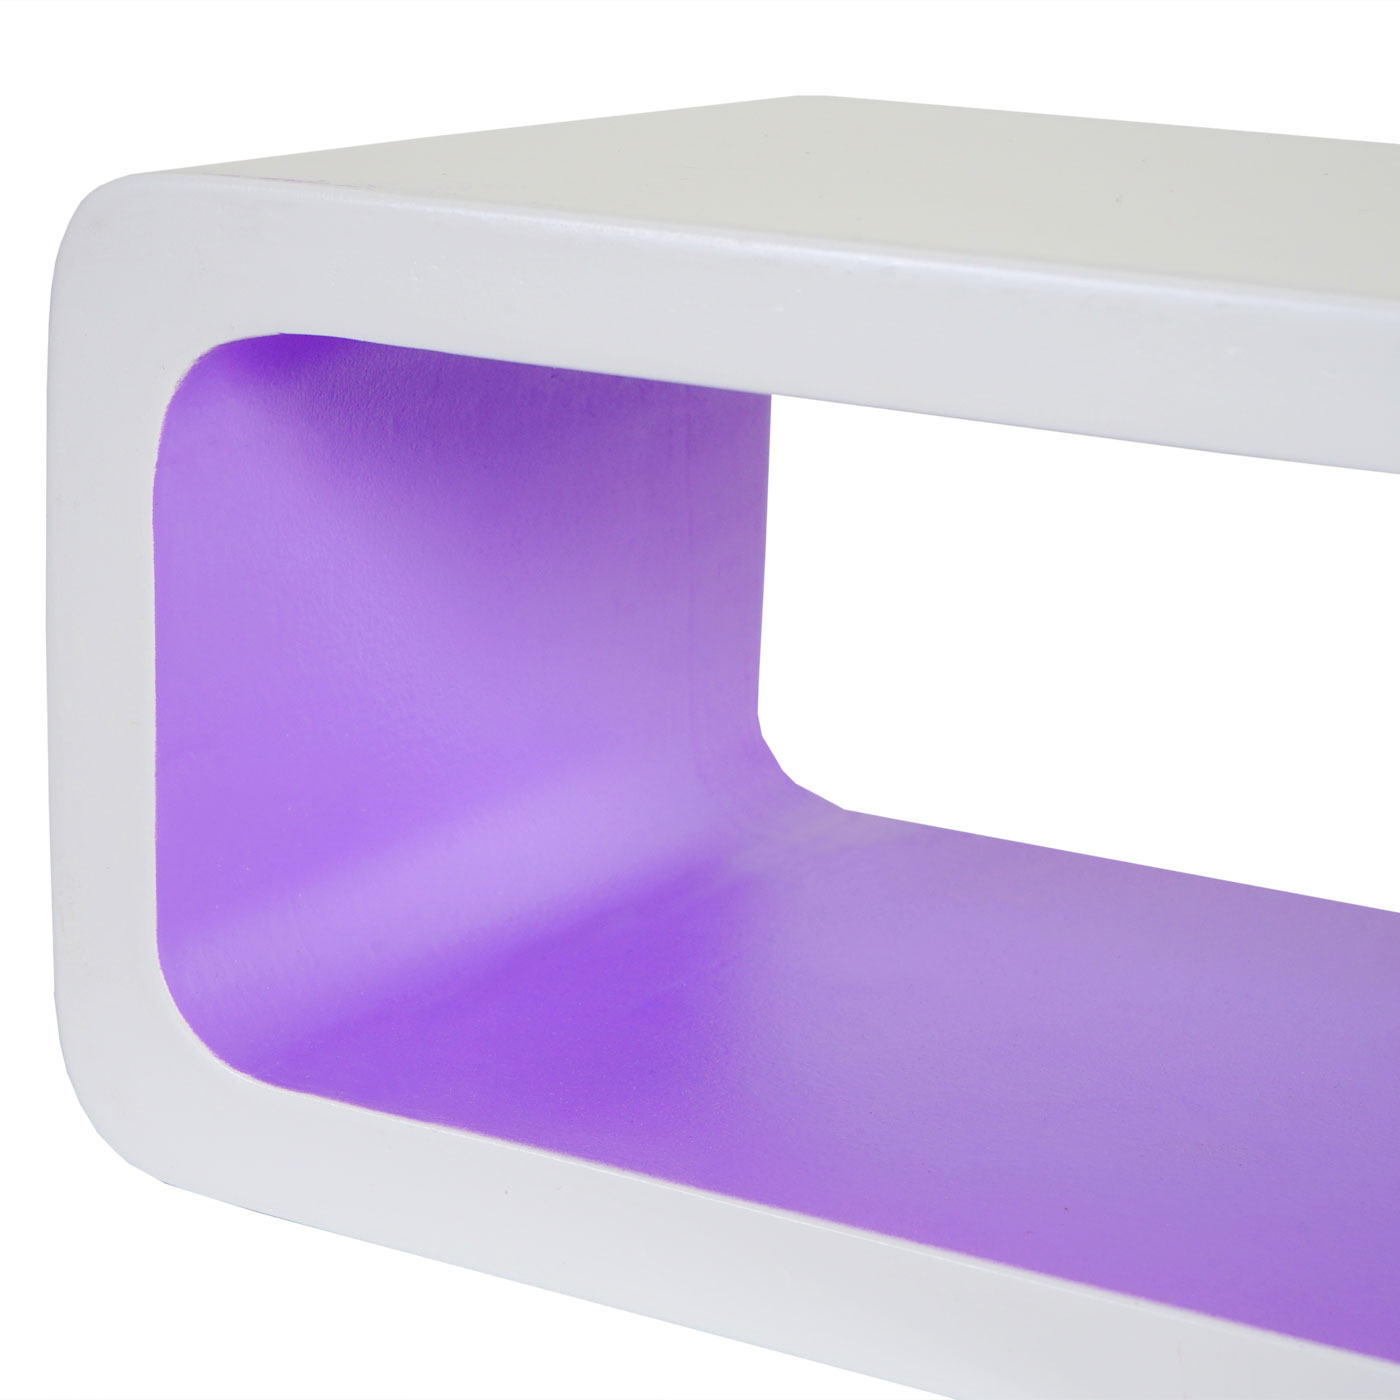 3x Wandregal Miami, Retro-Hängeregal Cube-Regal, bis 95cm ~ weiß/lila